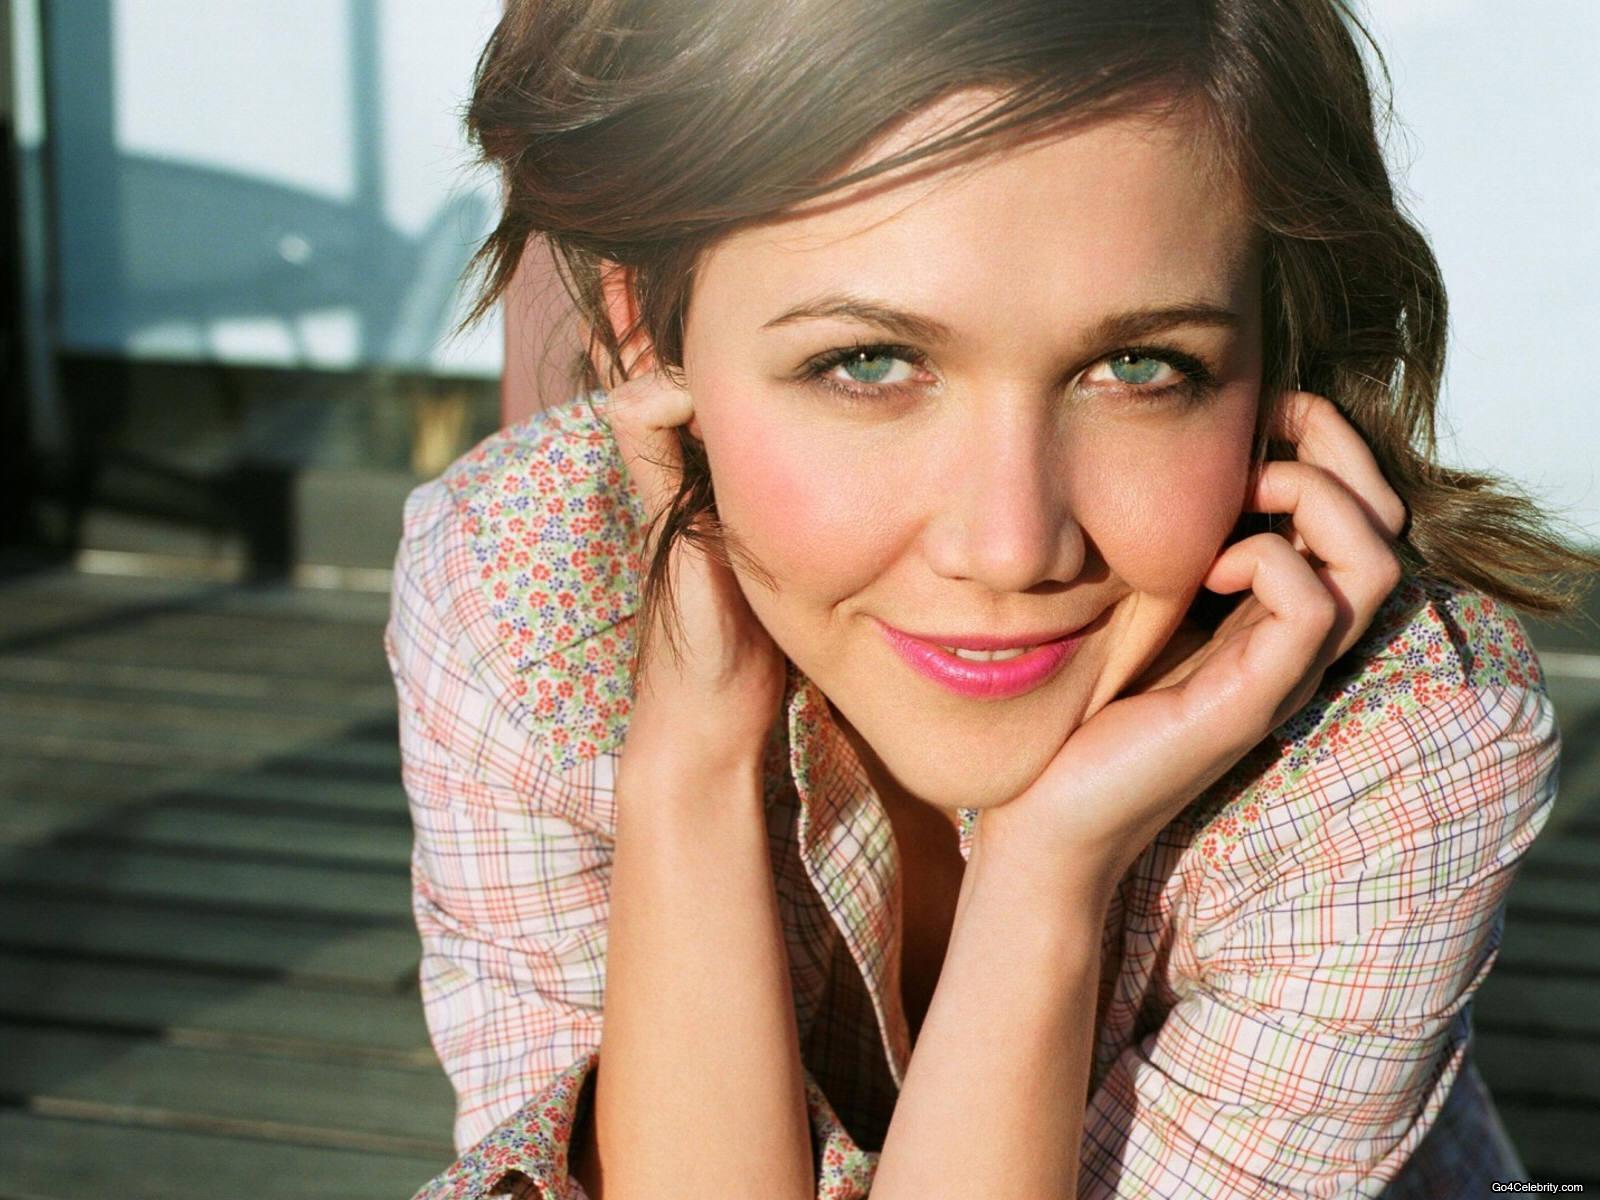 http://1.bp.blogspot.com/-QVd1UTySDt8/TZk49fSUUUI/AAAAAAAABOY/p-Y3P7MvHVI/s1600/Maggie-Gyllenhaal-004.jpg